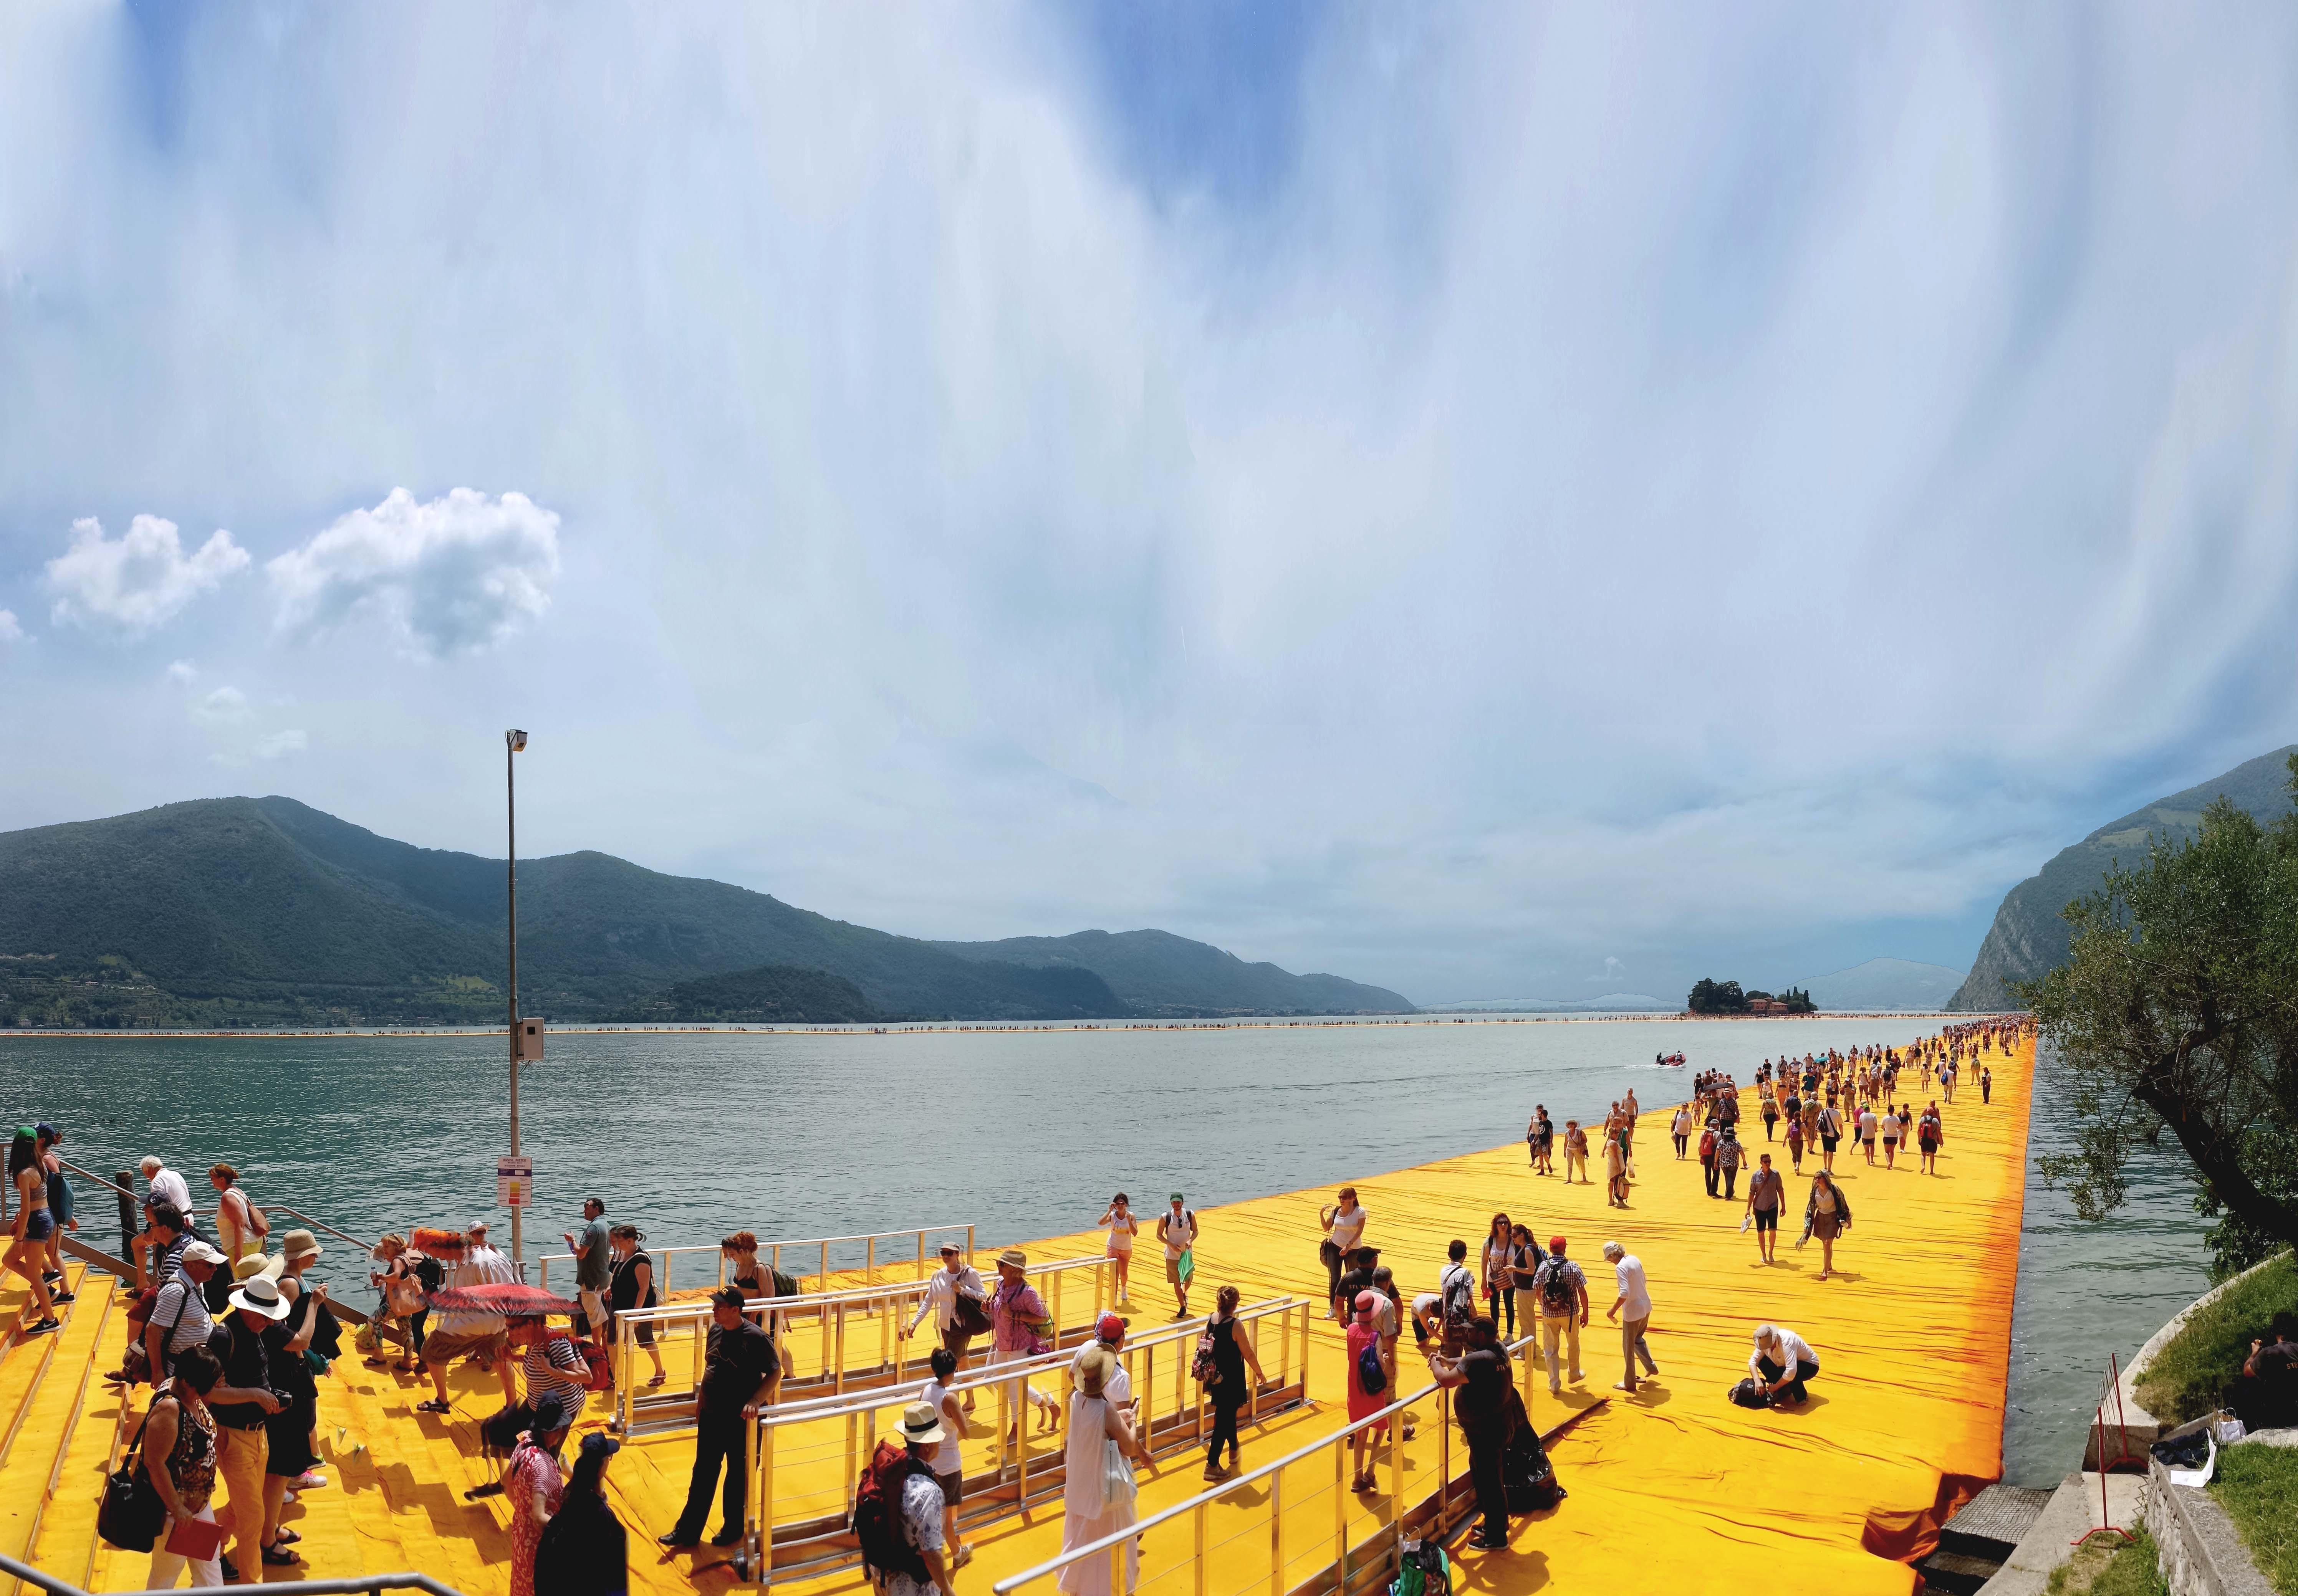 Christo, The Floating Piers, Lago d'Iseo (foto Anna Mattioli)